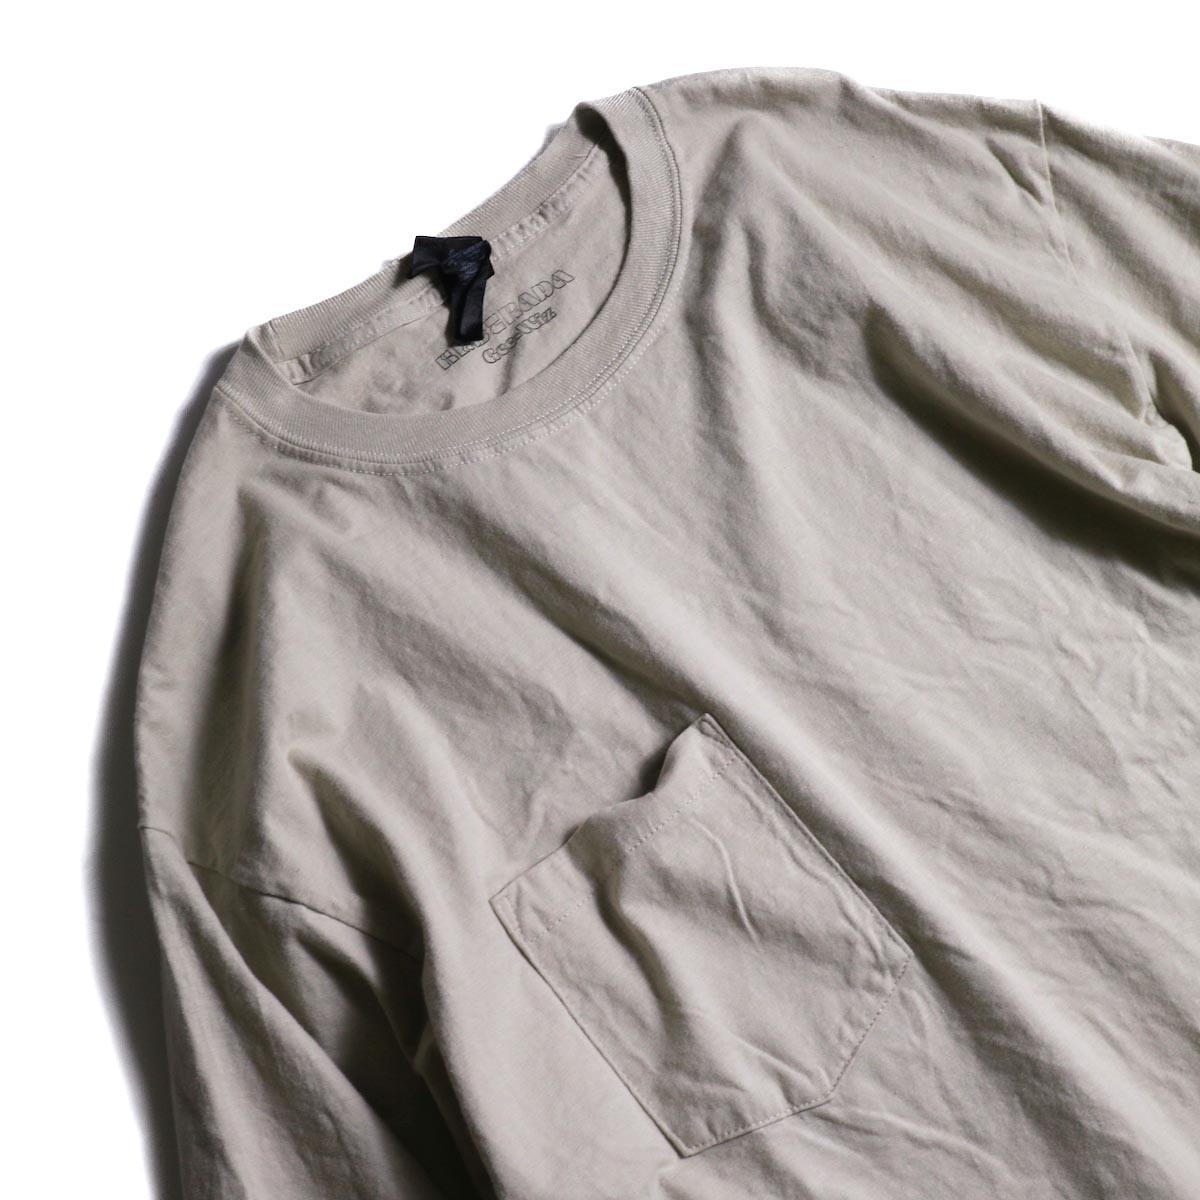 HESTRADA GEE-WIZ / SWITCH L/S Tee (Sand)襟、ポケット